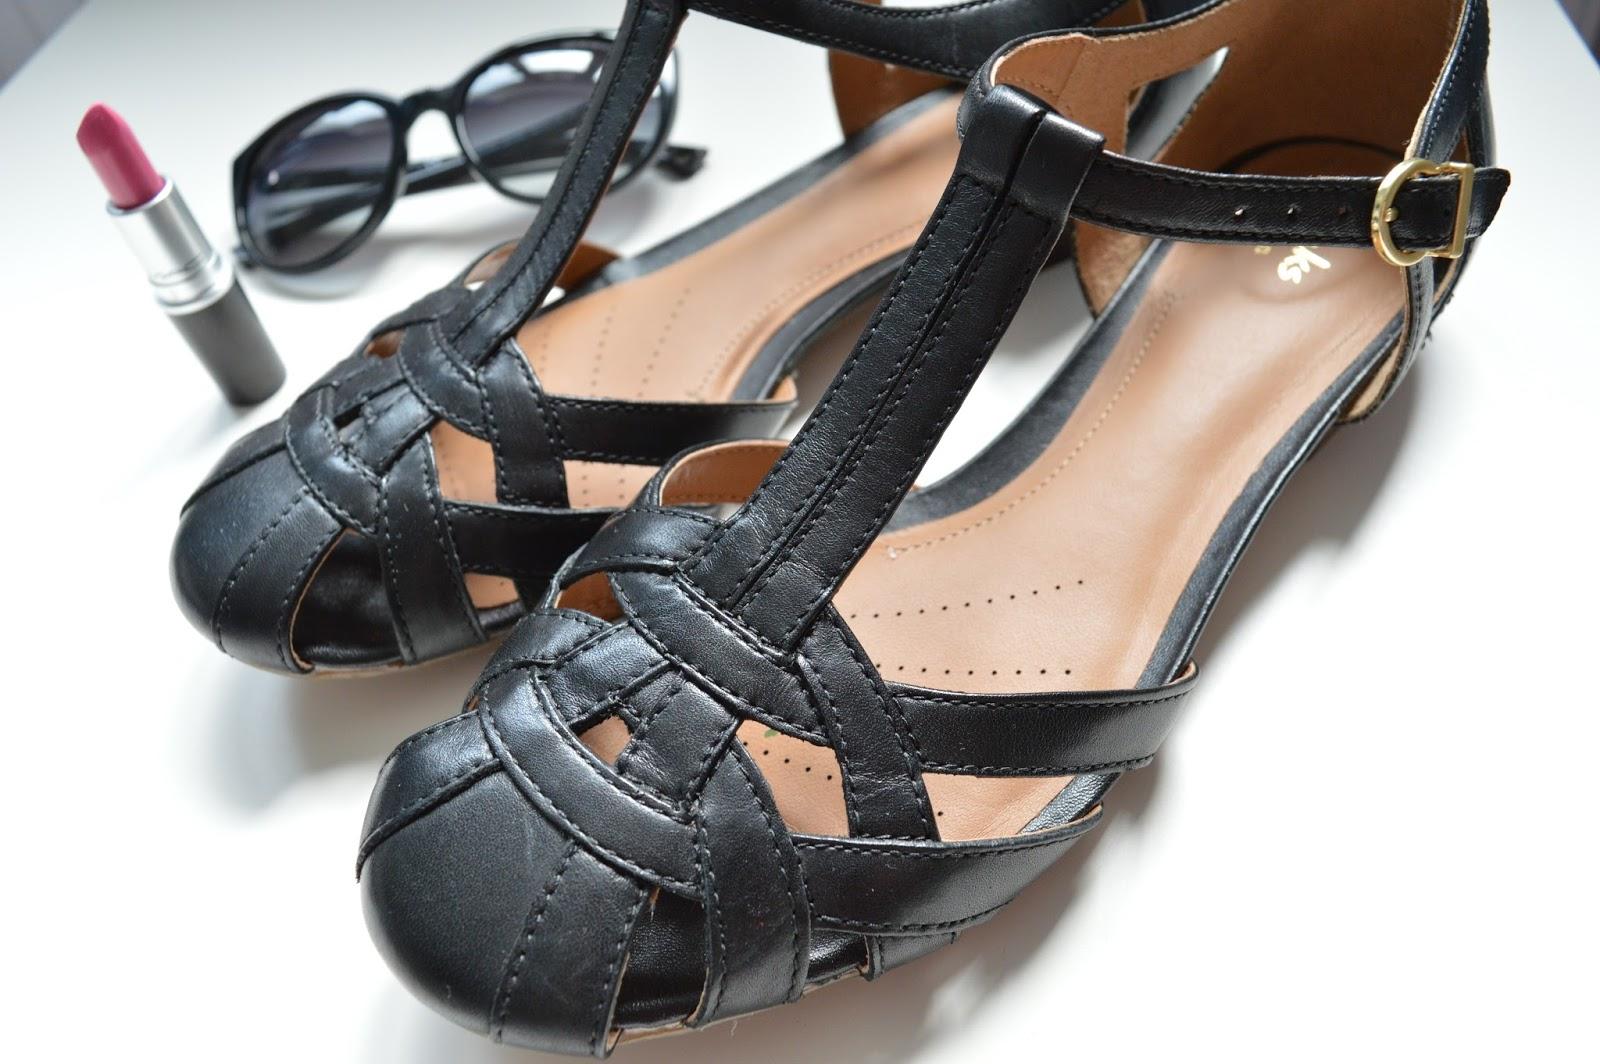 Brantano Uk Shoes